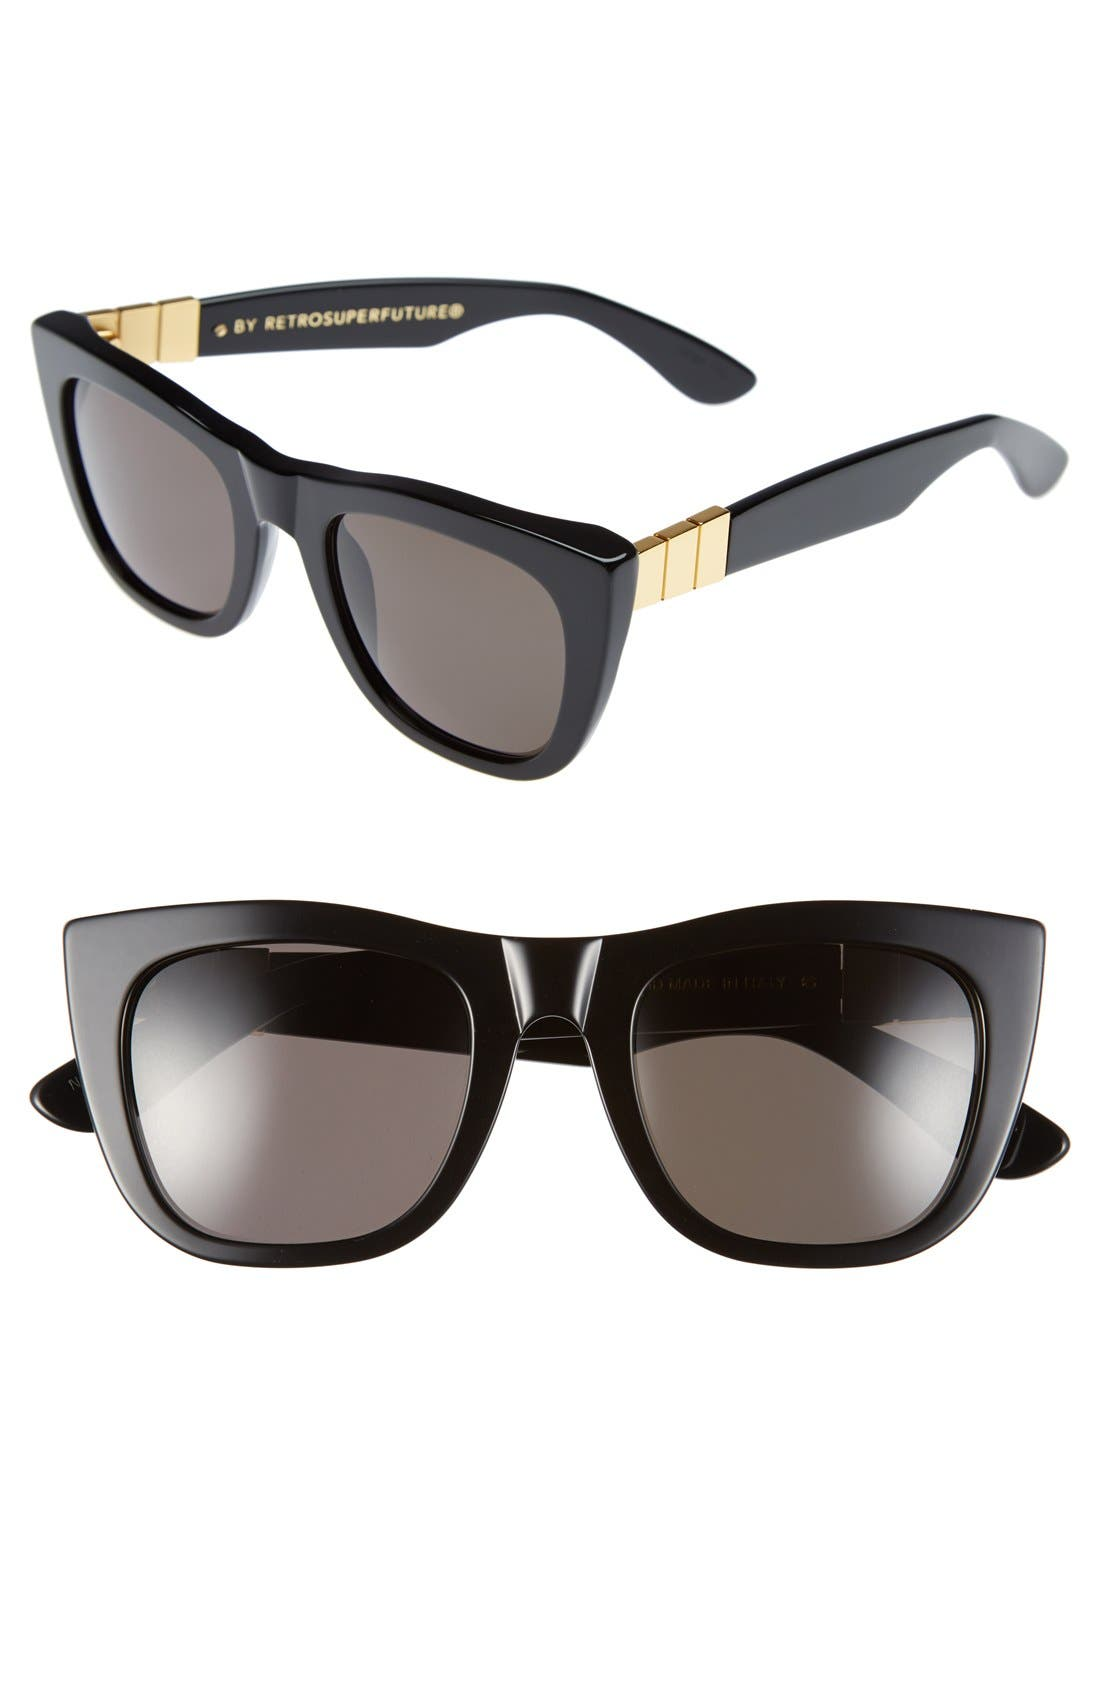 Alternate Image 1 Selected - SUPER by RETROSUPERFUTURE® 'Gals' 50mm Retro Sunglasses